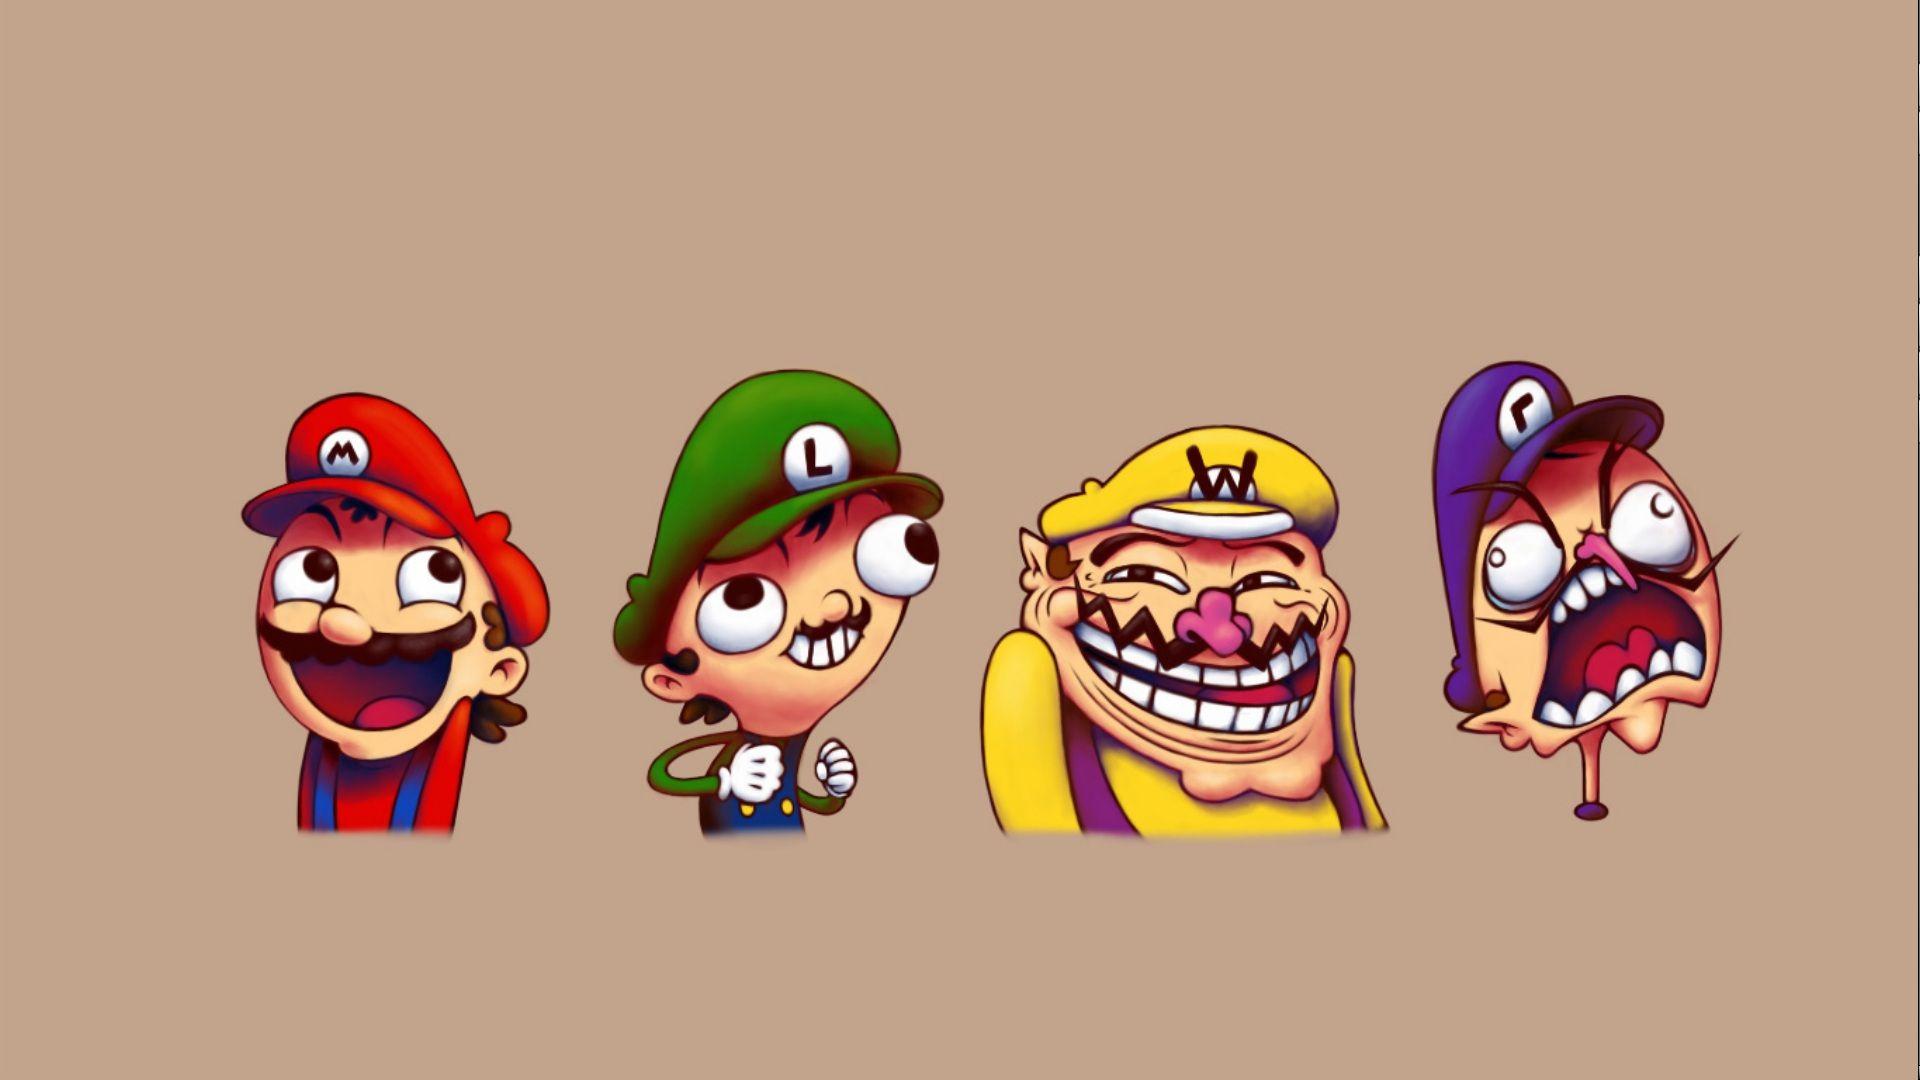 Imgur Meme Background Mario Super Mario Funny band of memes hd images desktop